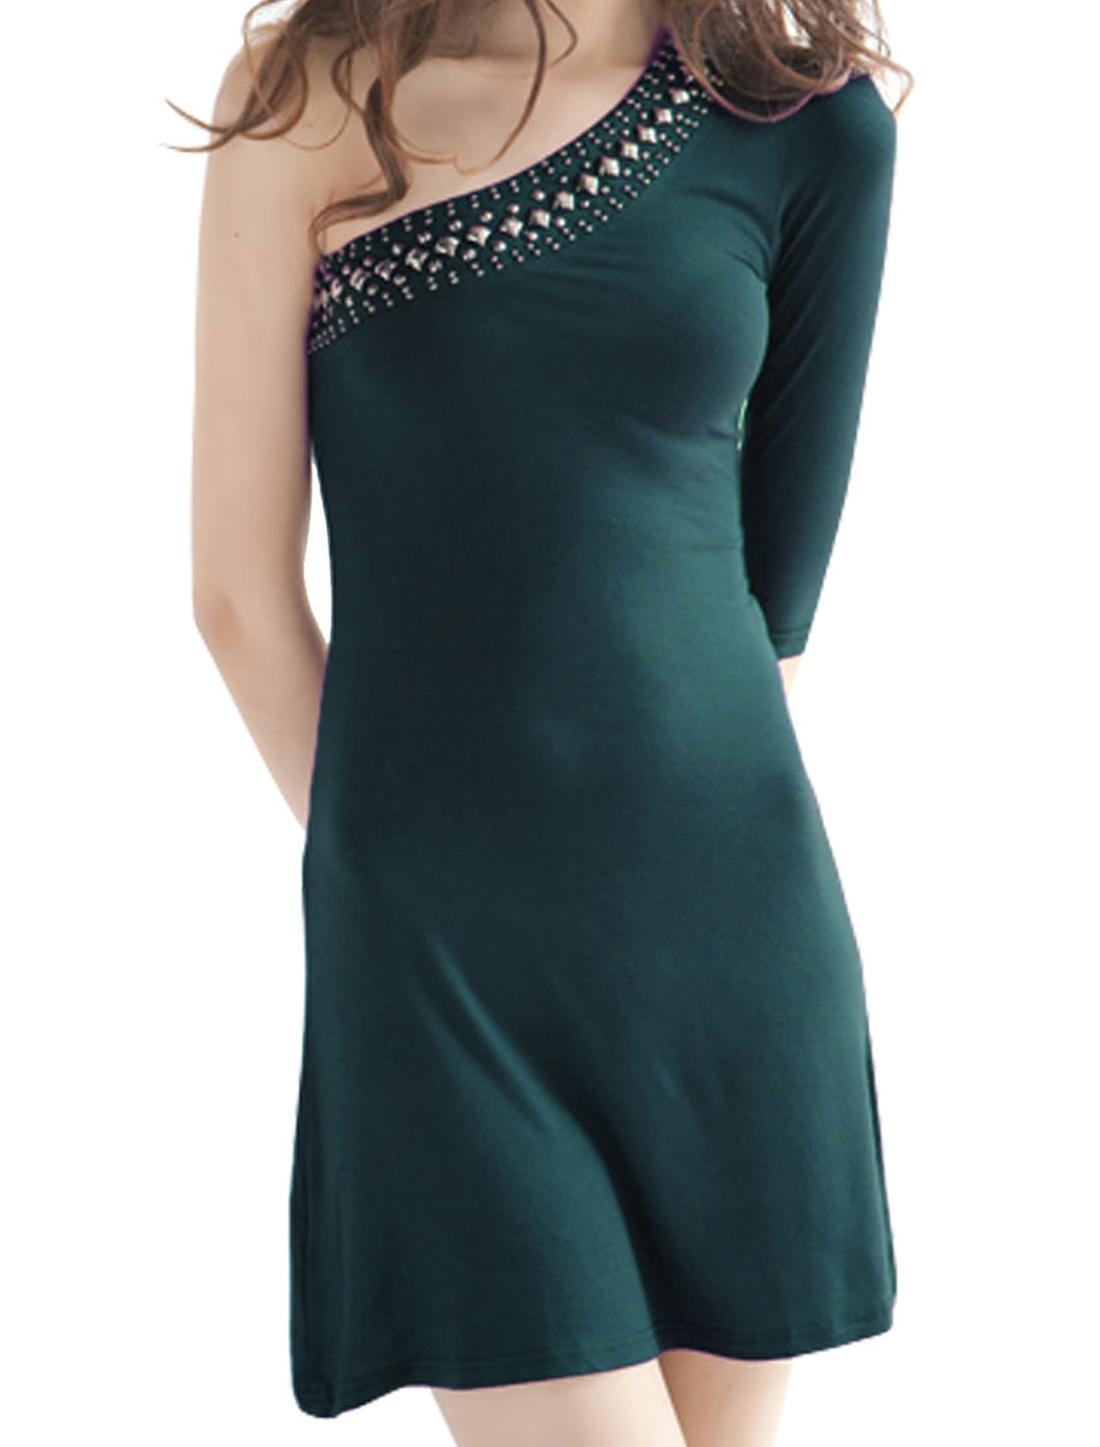 Women Beads Accent One Shoulder 1/2 Sleeves Dress Dark Green XS